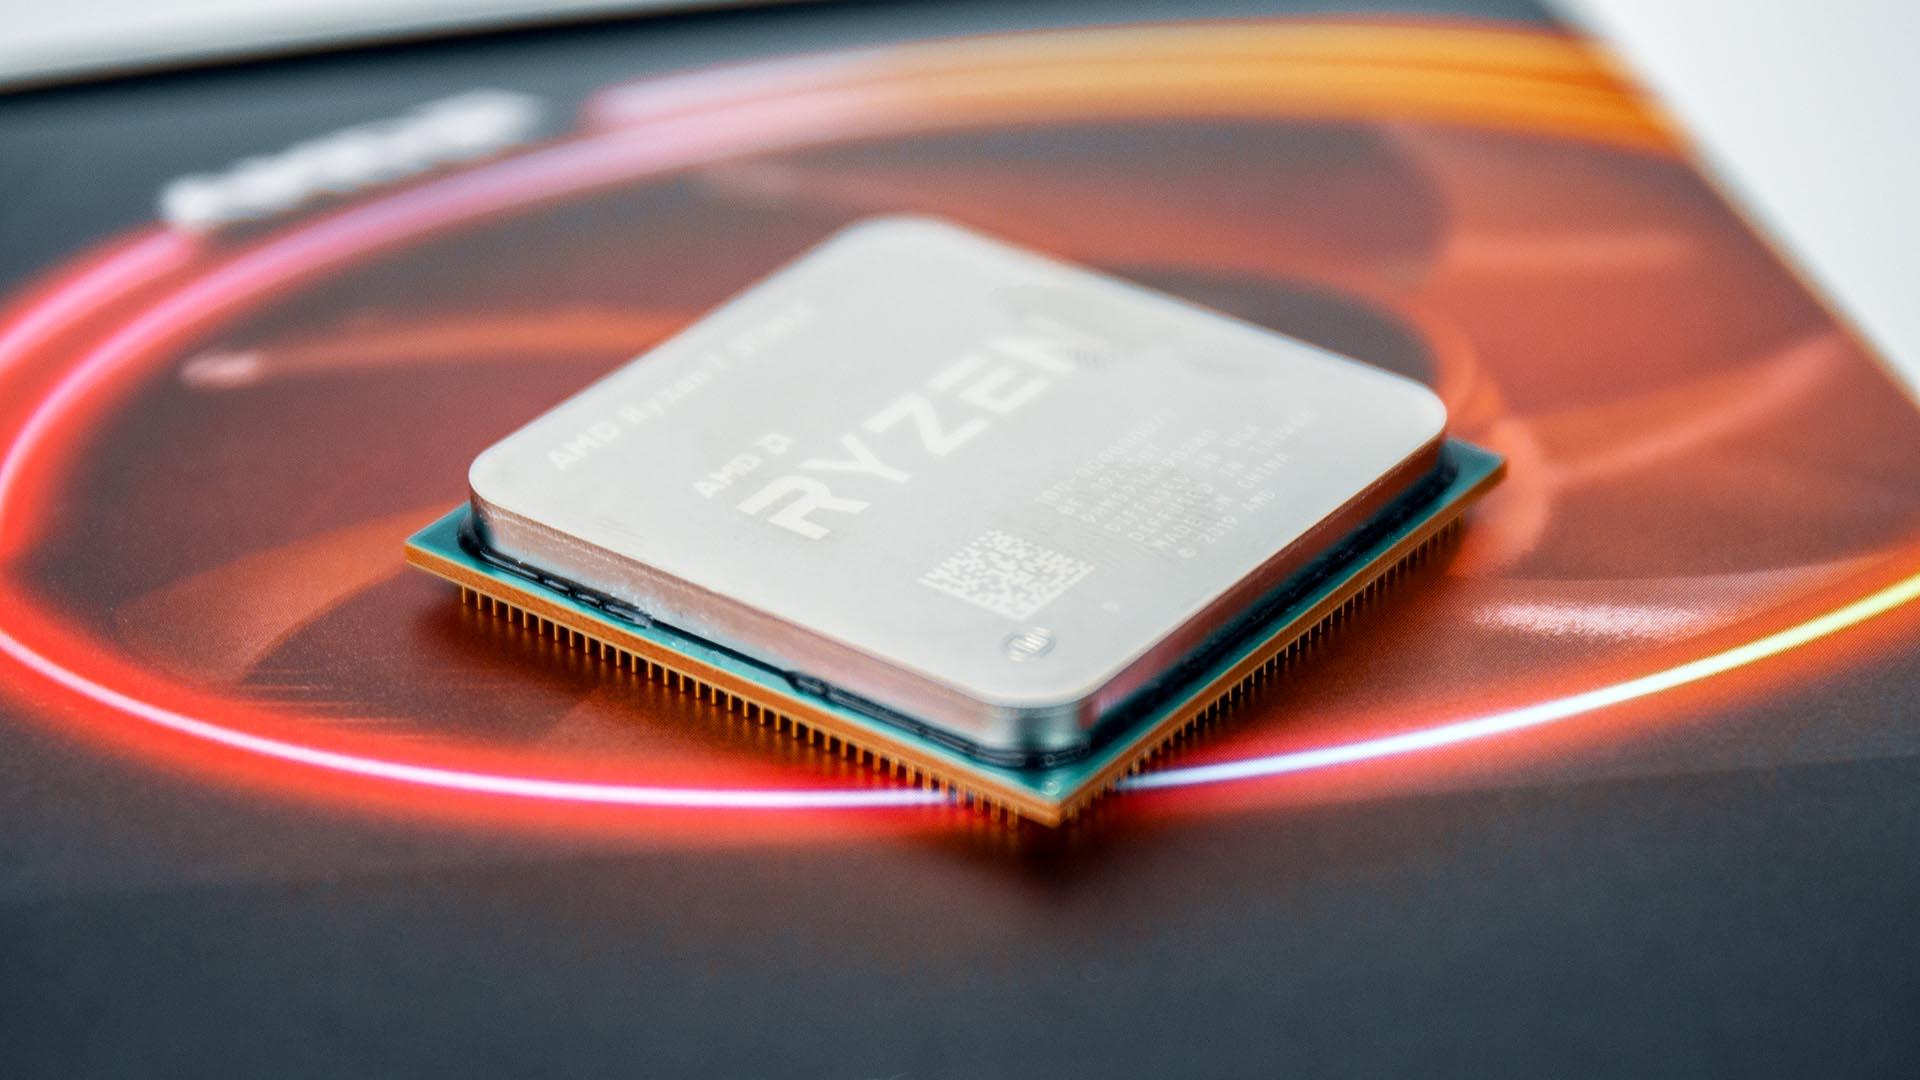 AMD Ryzen 7 3700X review: what a generational CPU update should look like | PCGamesN